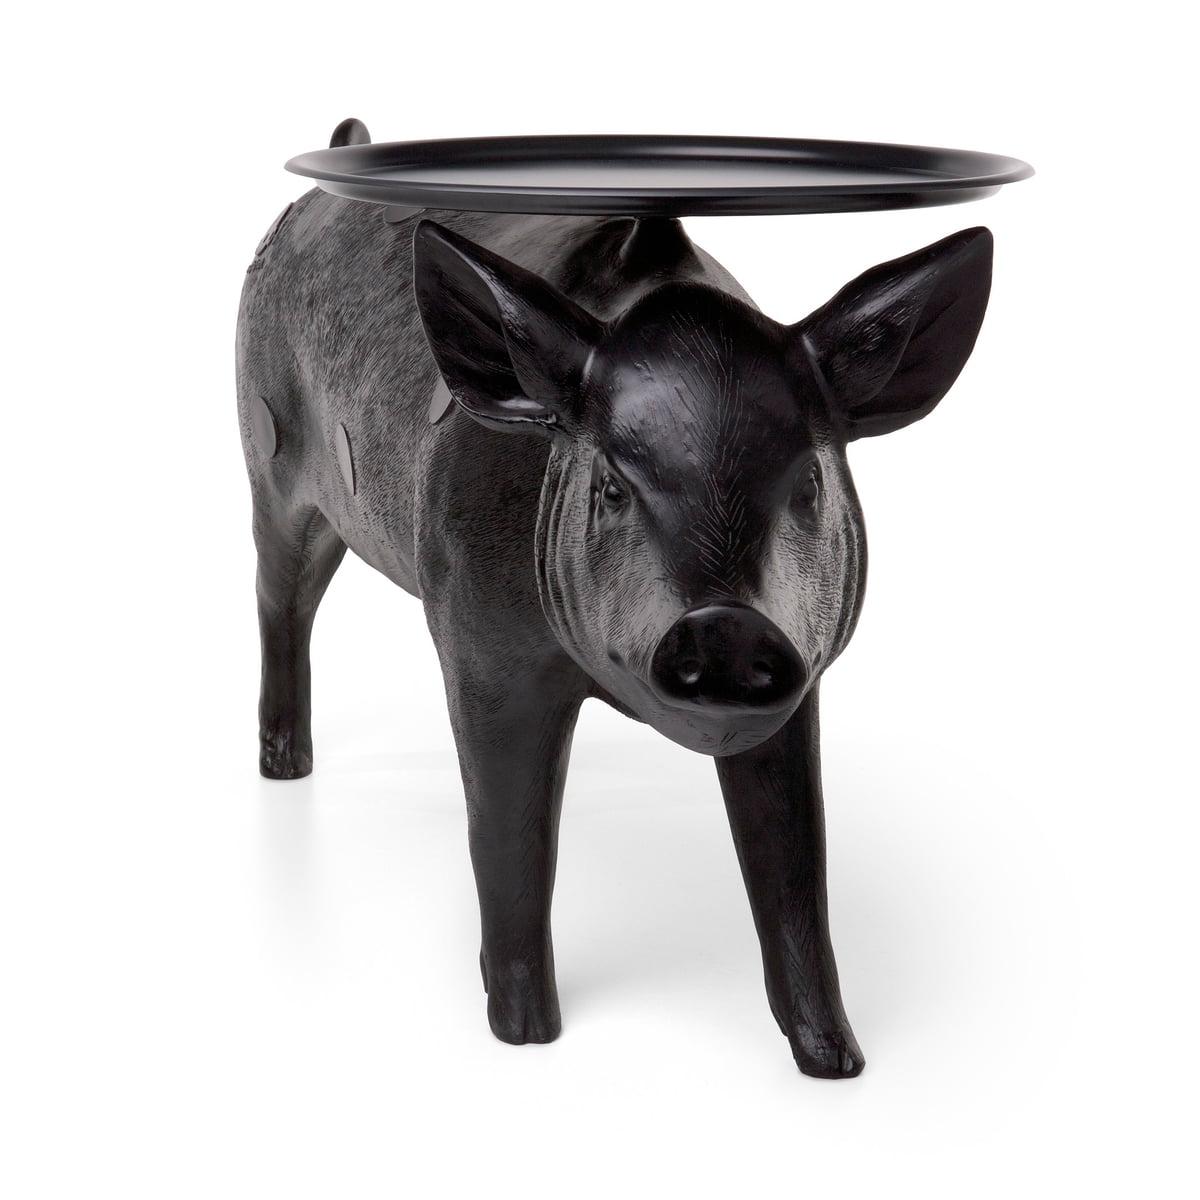 mooi furniture. Moooi - Pig Table, Black Mooi Furniture